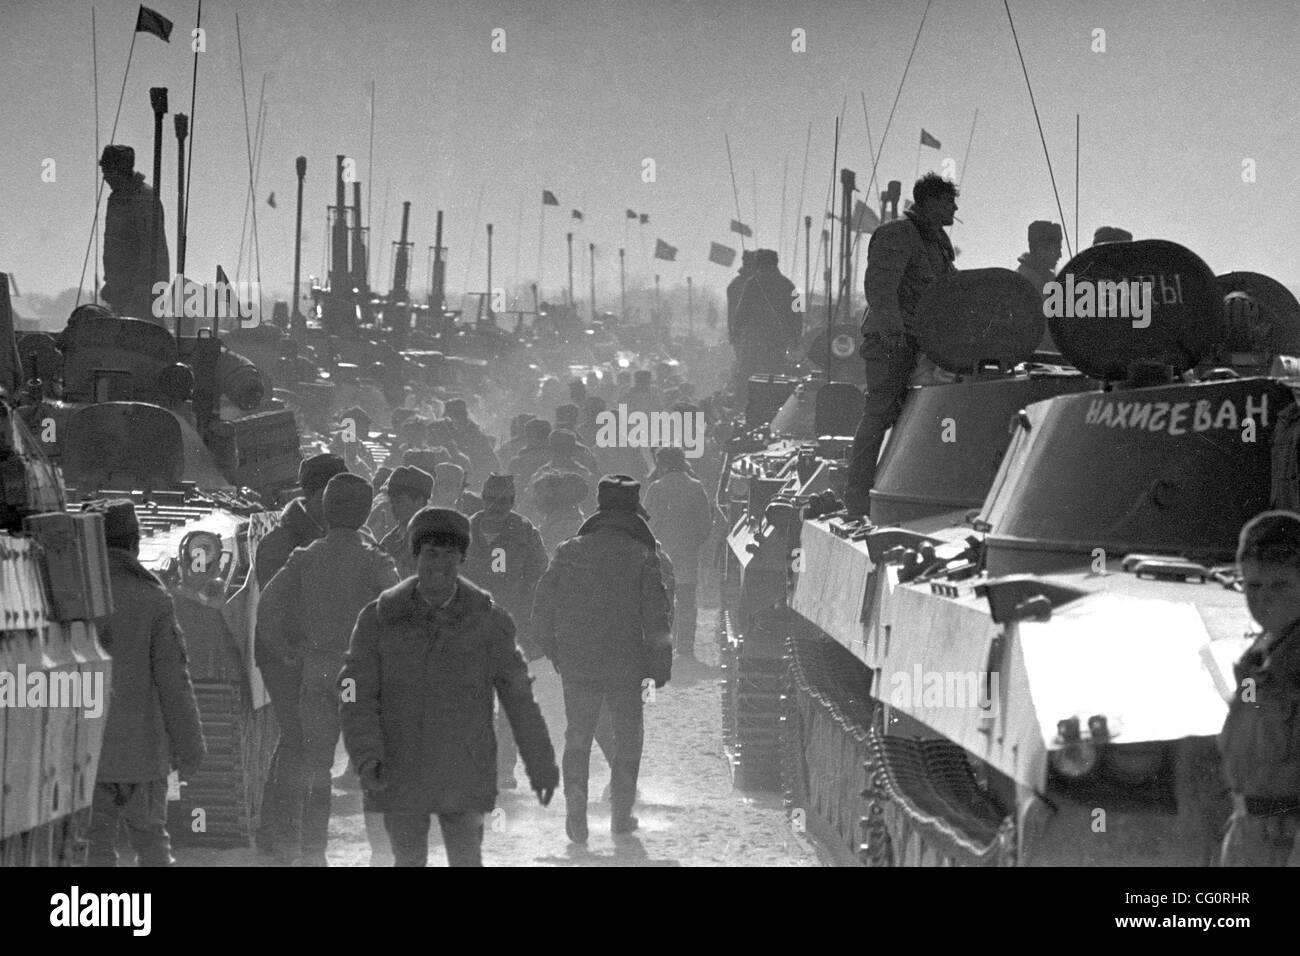 Soviet Afghanistan war - Page 6 Jul-12-2007-kabul-afghanistan-the-soviet-war-in-afghanistan-was-a-CG0RHR